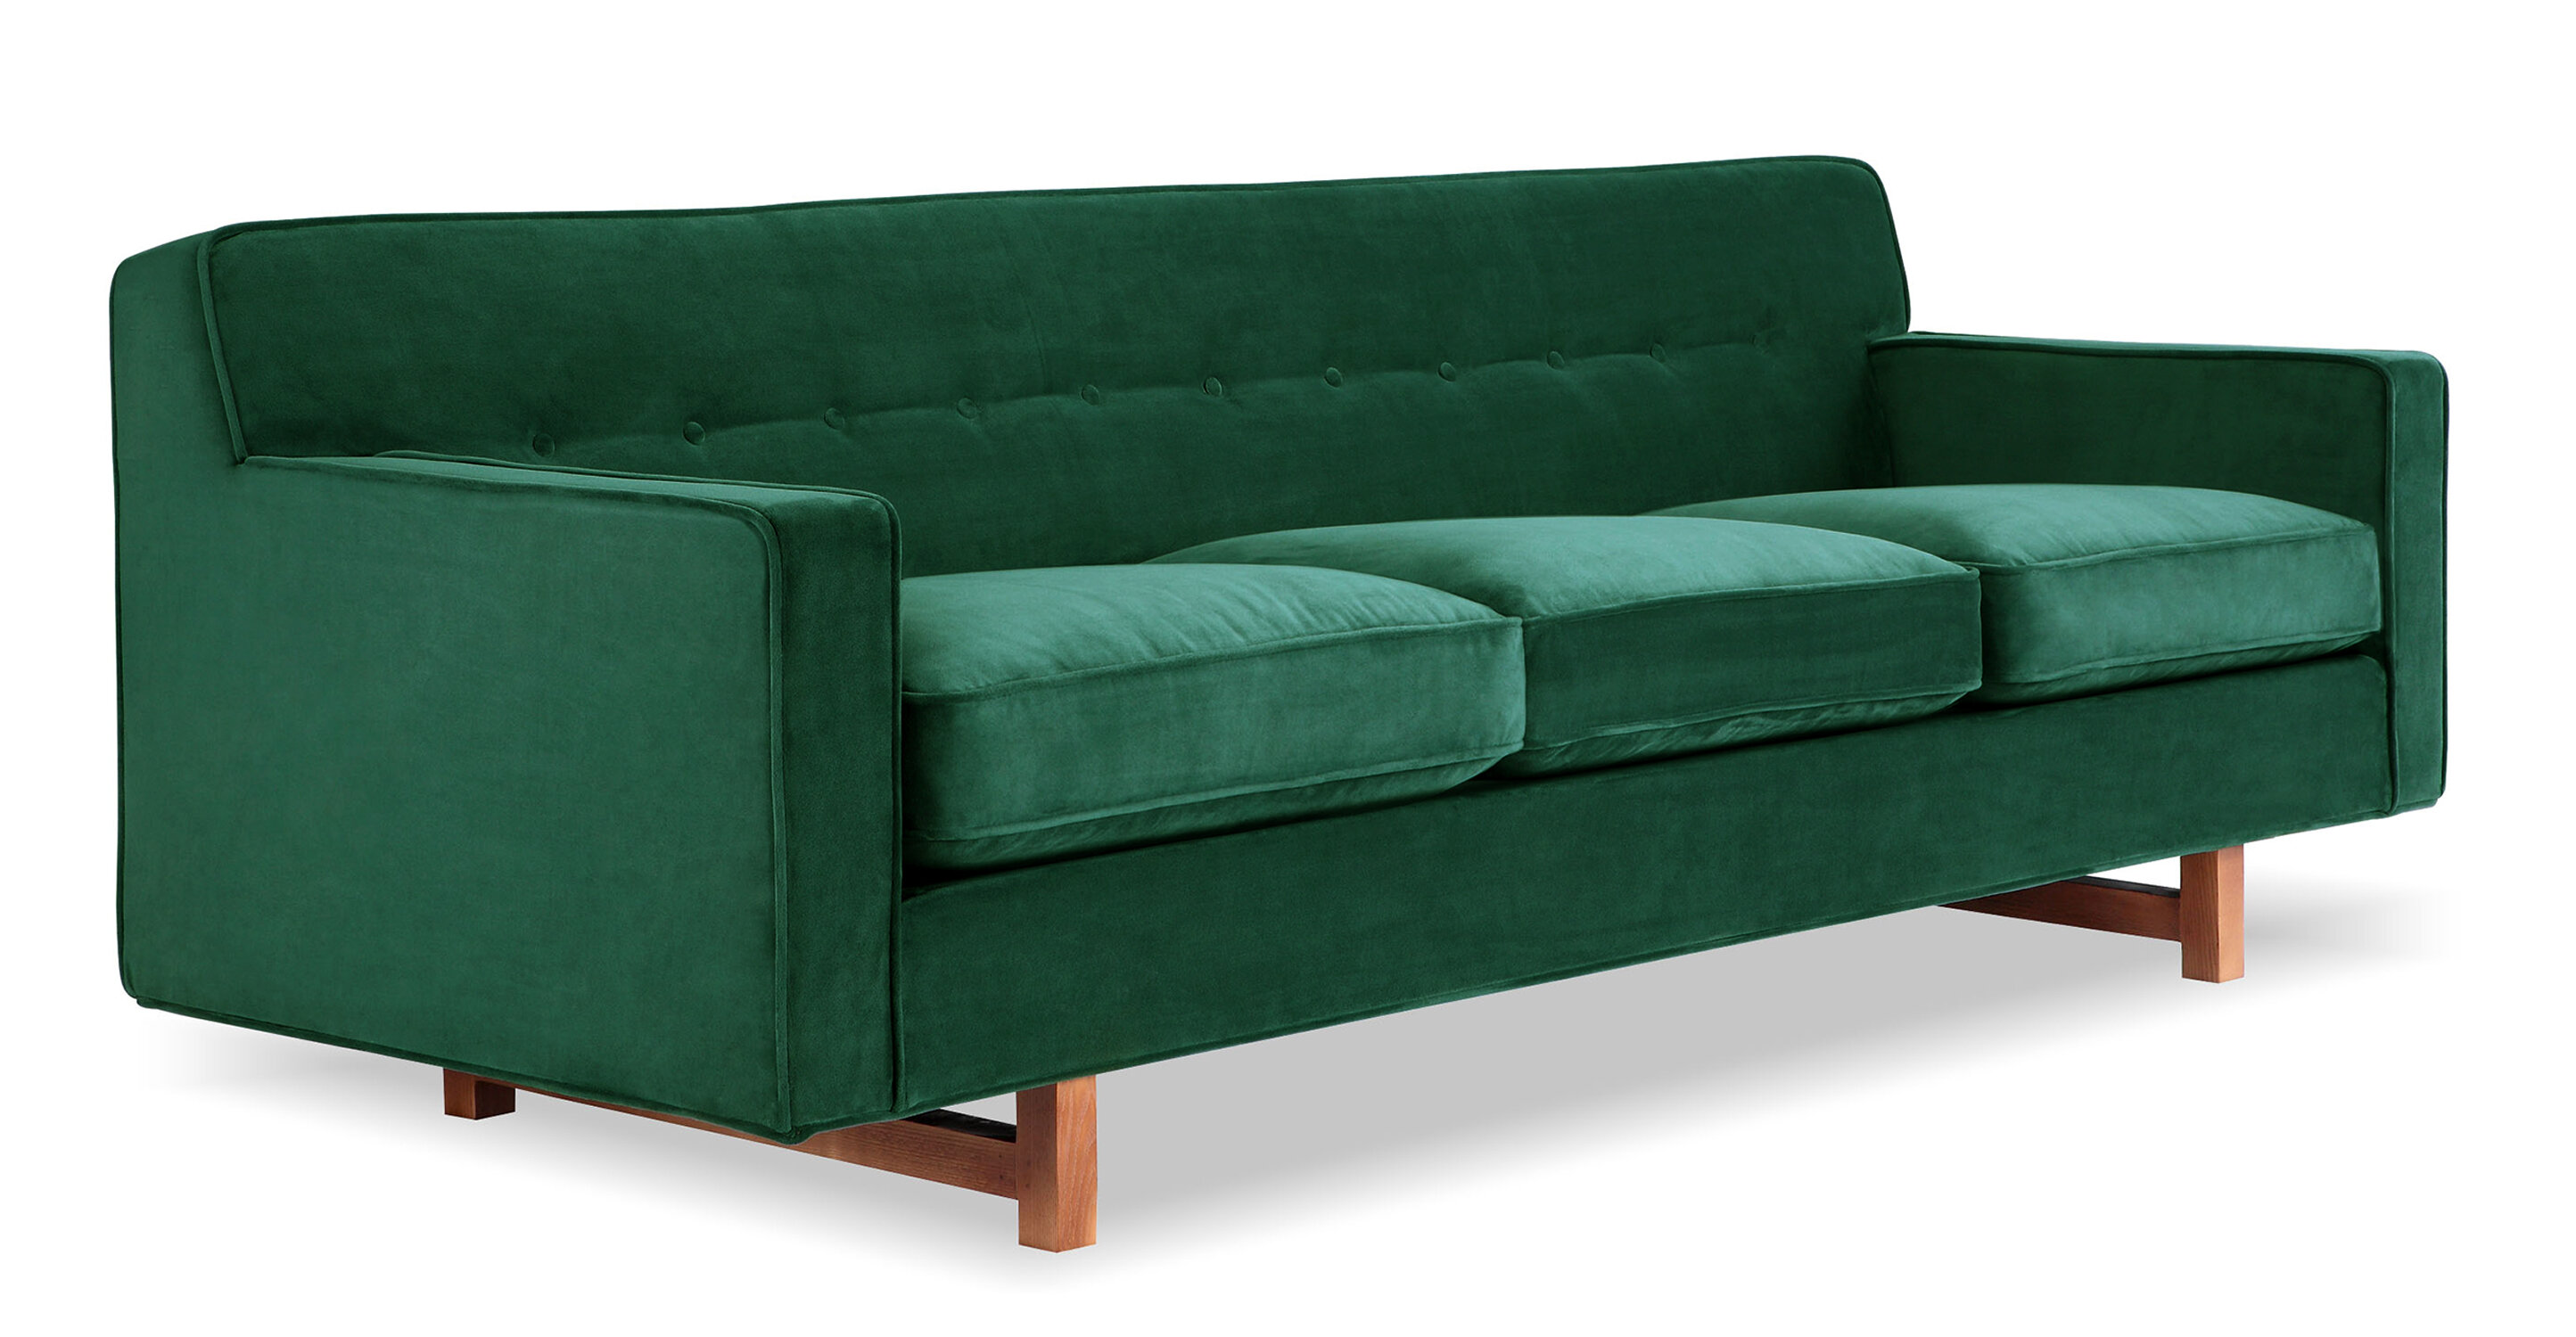 Lomonaco Mid-Century Modern Classic Sofa